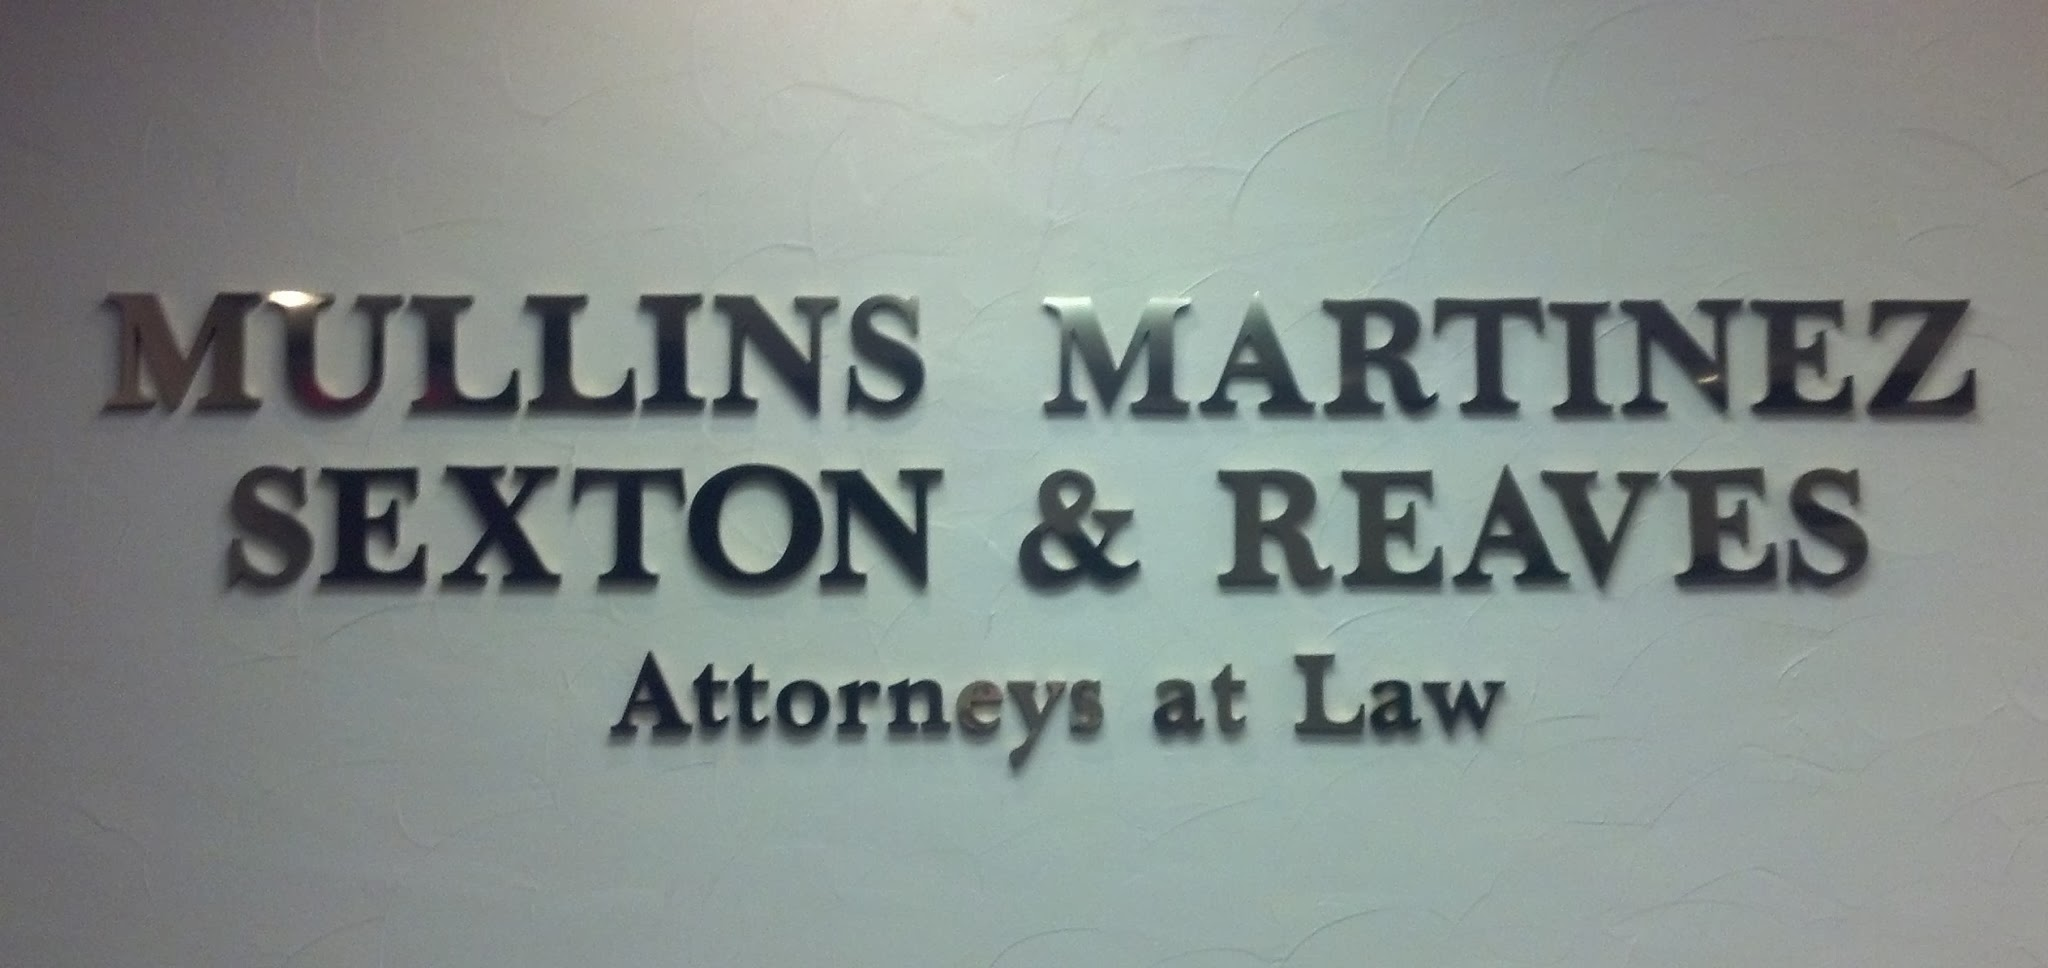 Mullins Martinez Sexton & Reaves, PC